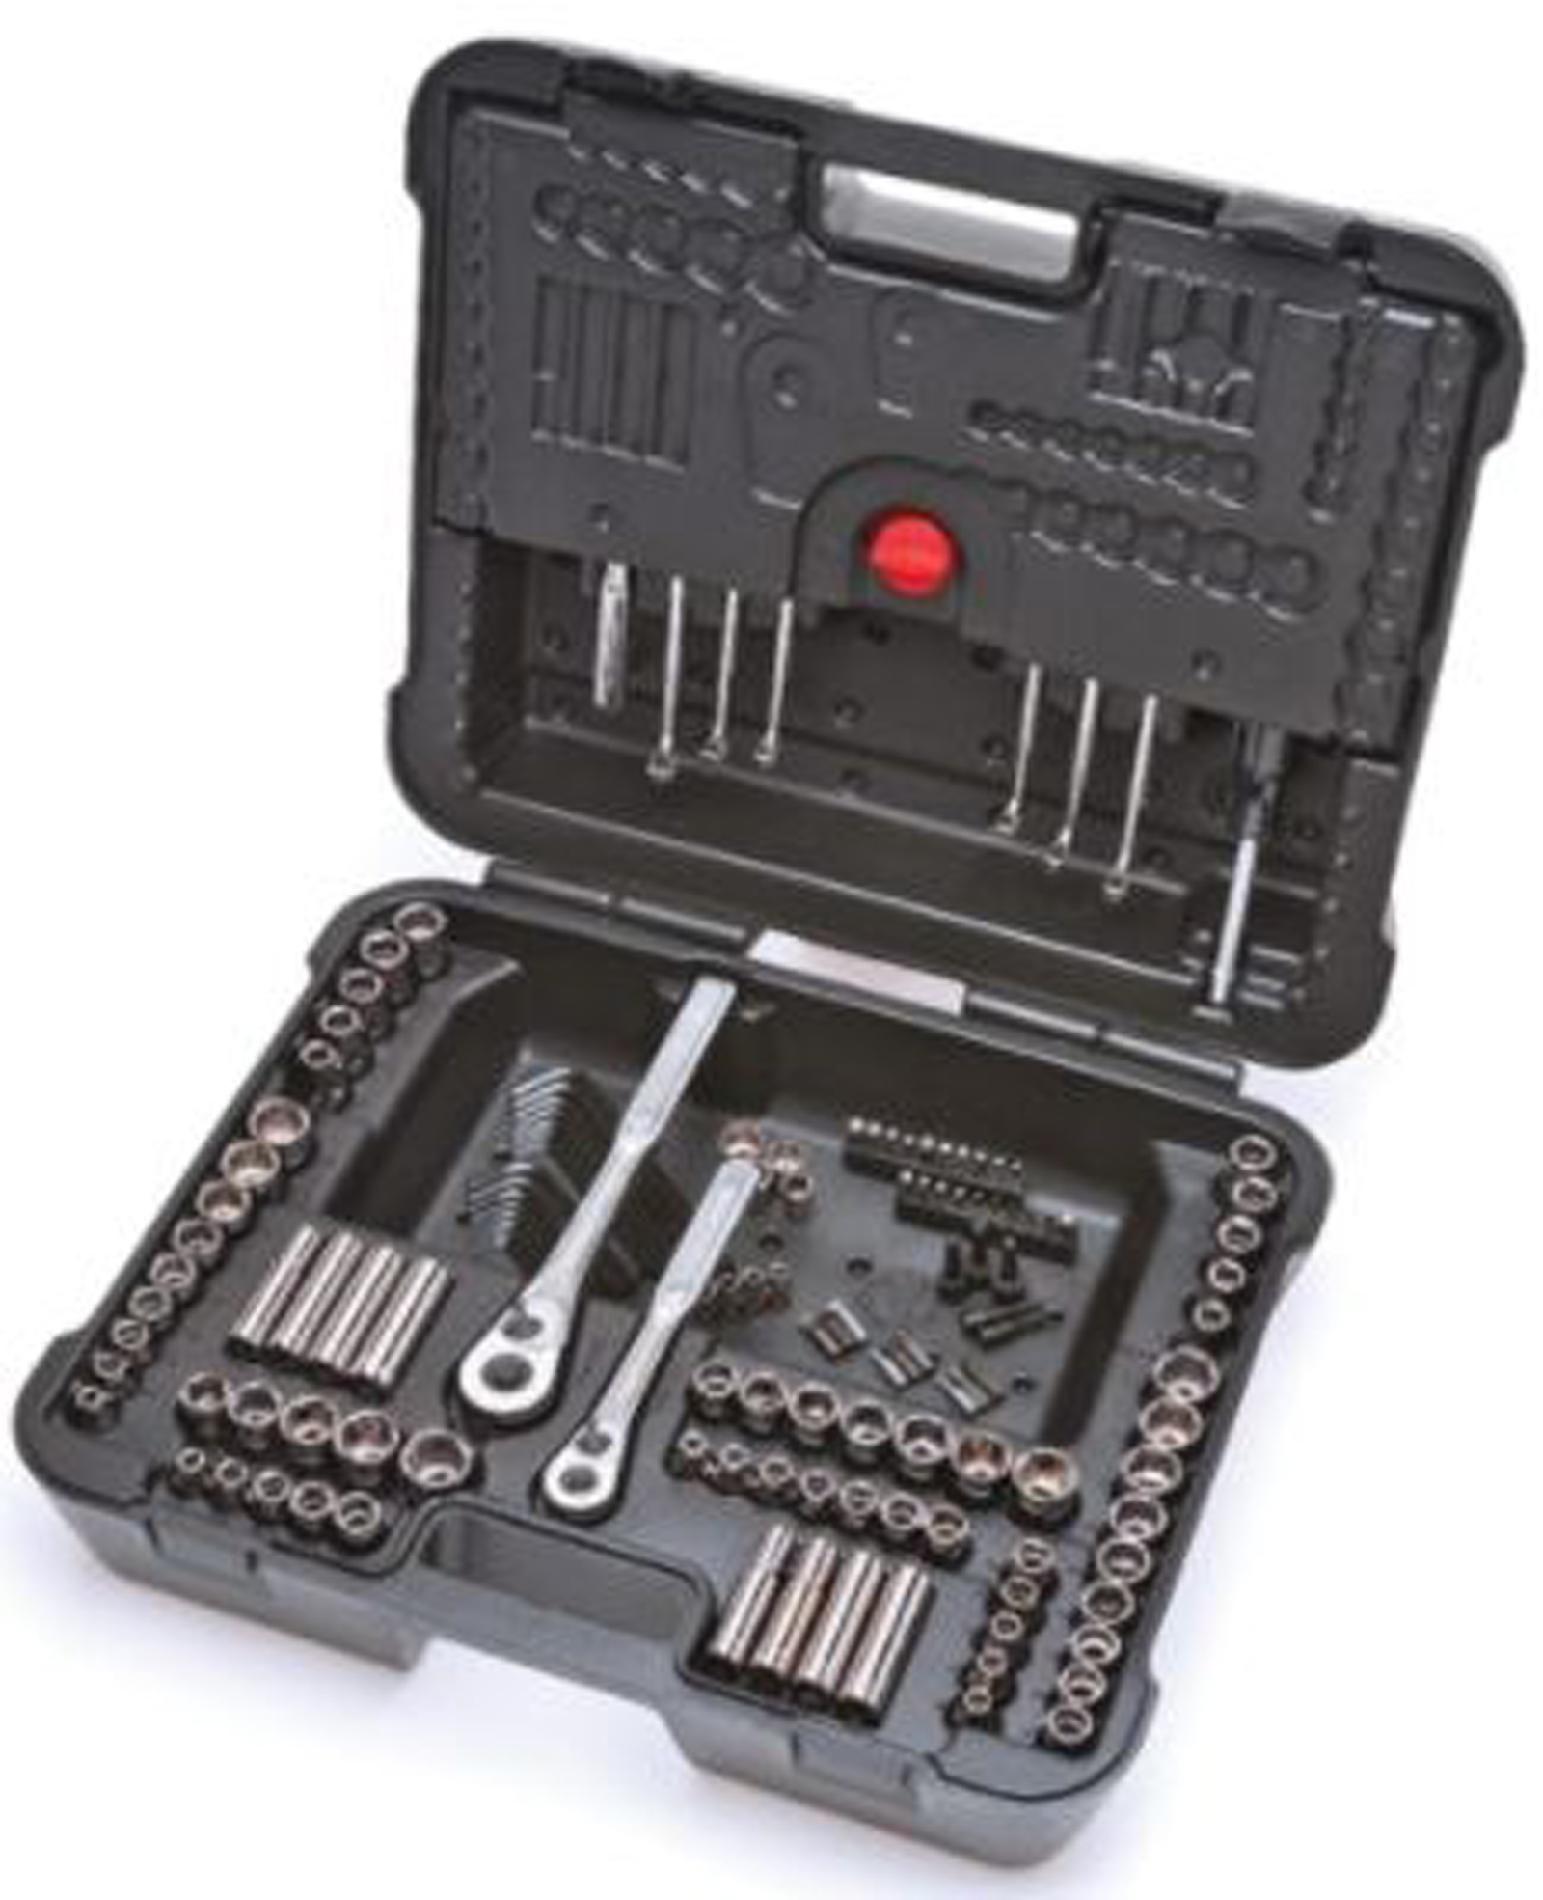 Craftsman 220 Pc Mechanics Tool Set With Case